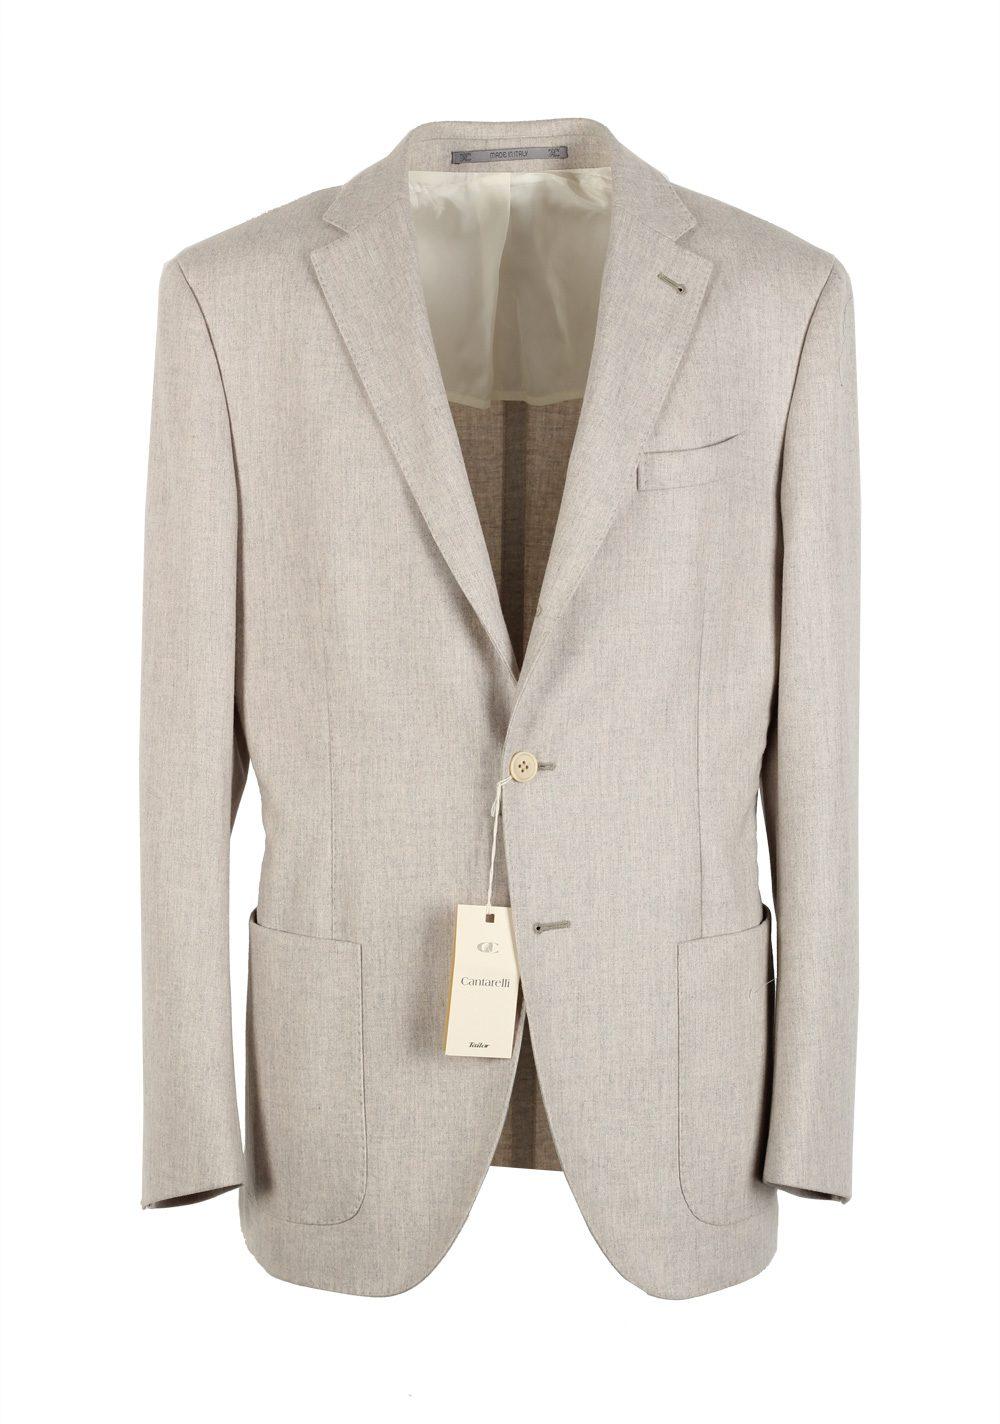 Cantarelli Sport Coat Size 50 / 40R U.S. Wool | Costume Limité